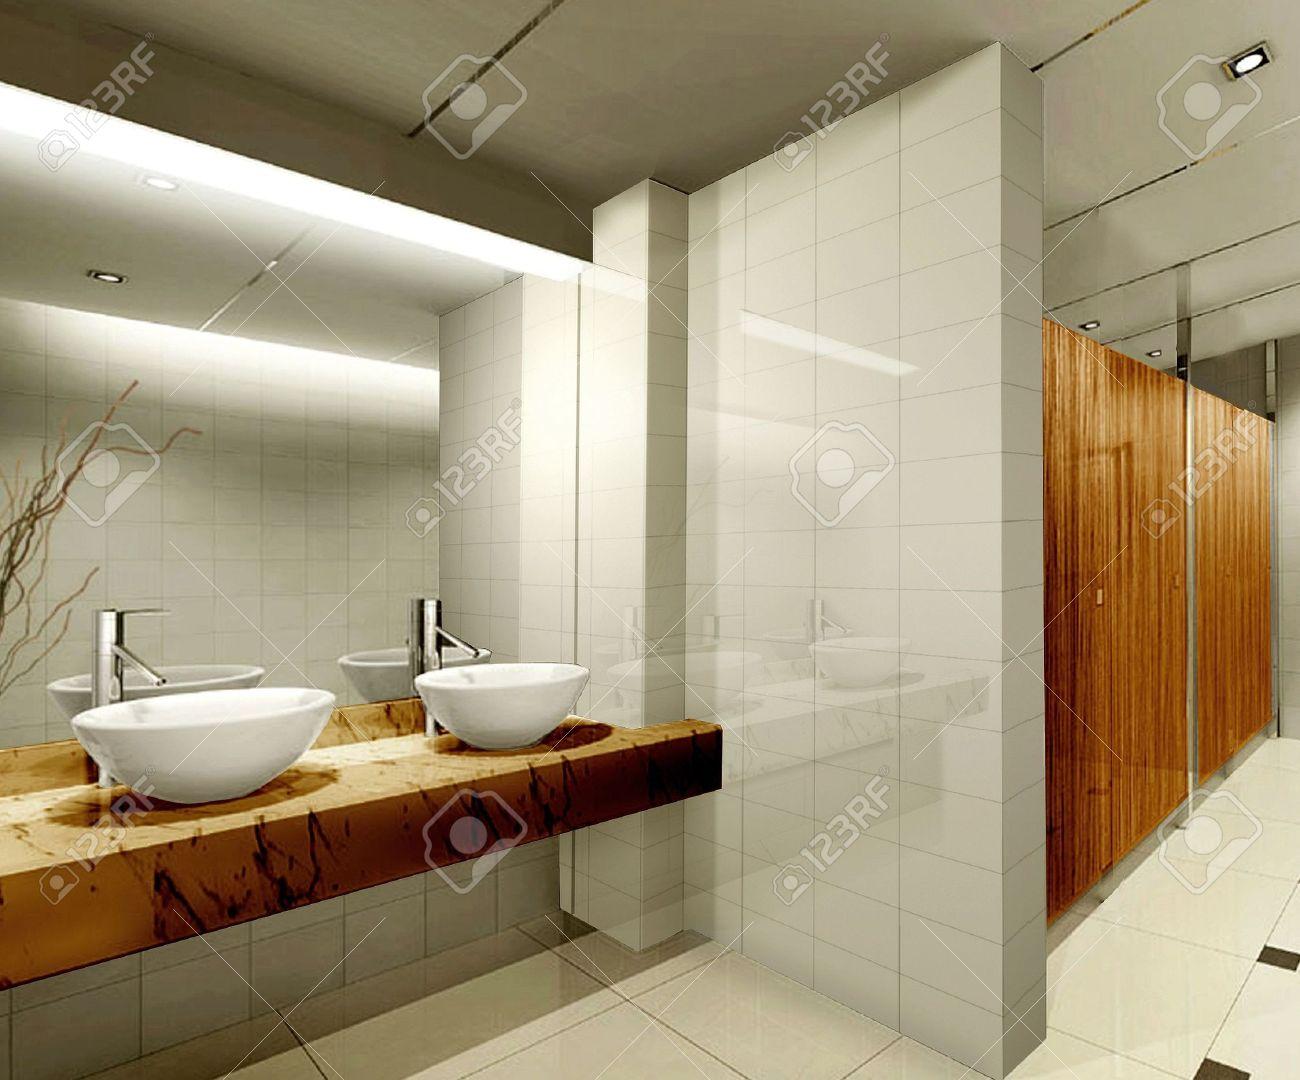 Modern Design Interior Of Stylish Bathroom 3D Render Stock Photo